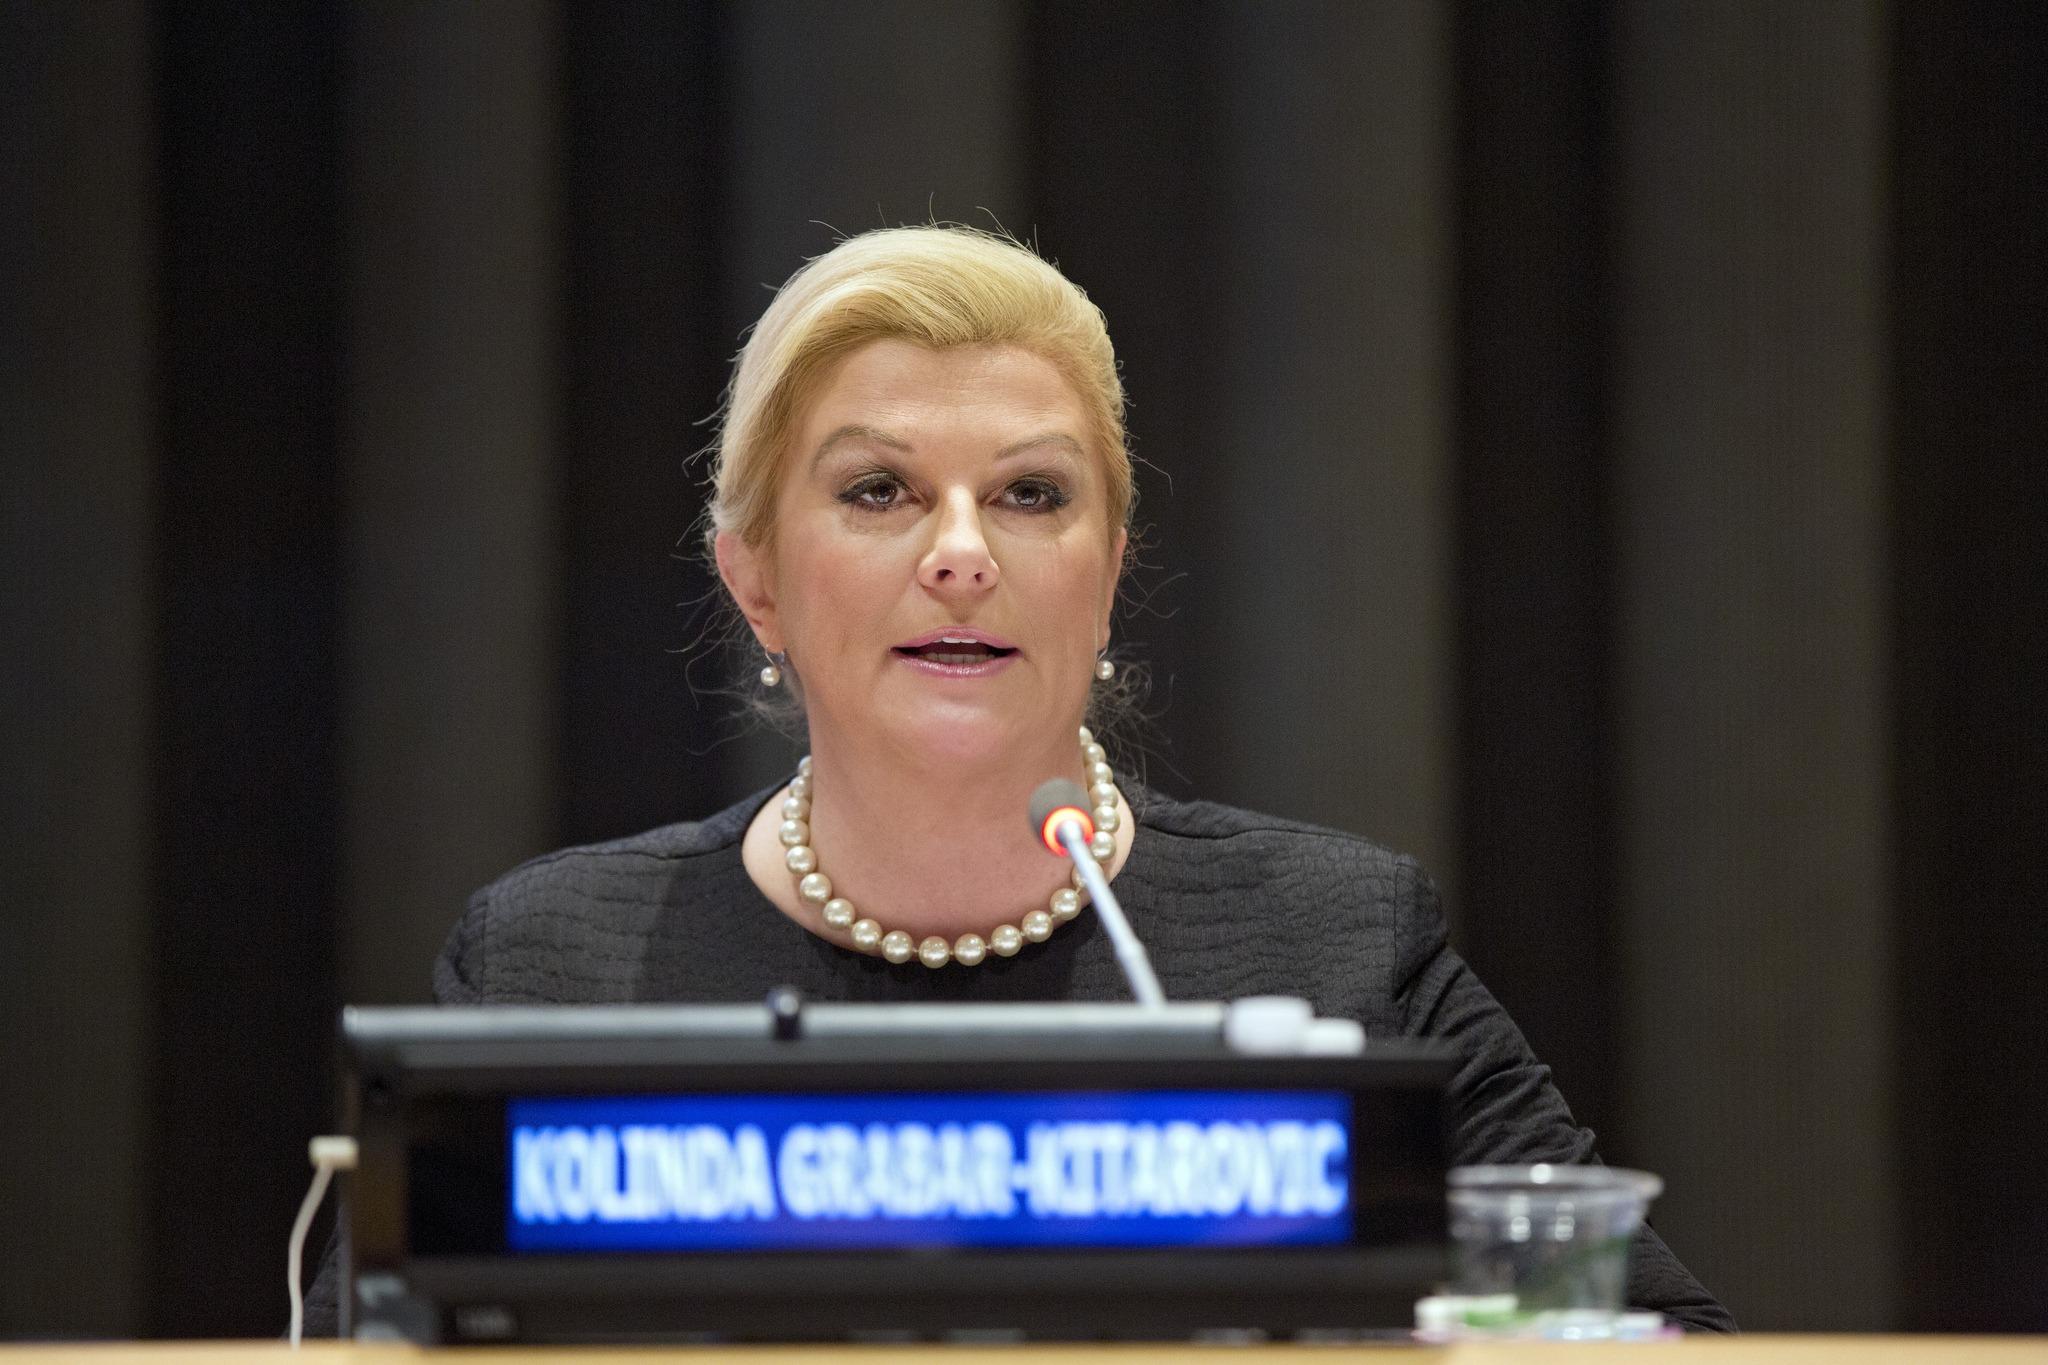 Kolinda Grabar-Kitarović becomes Croatia's first female